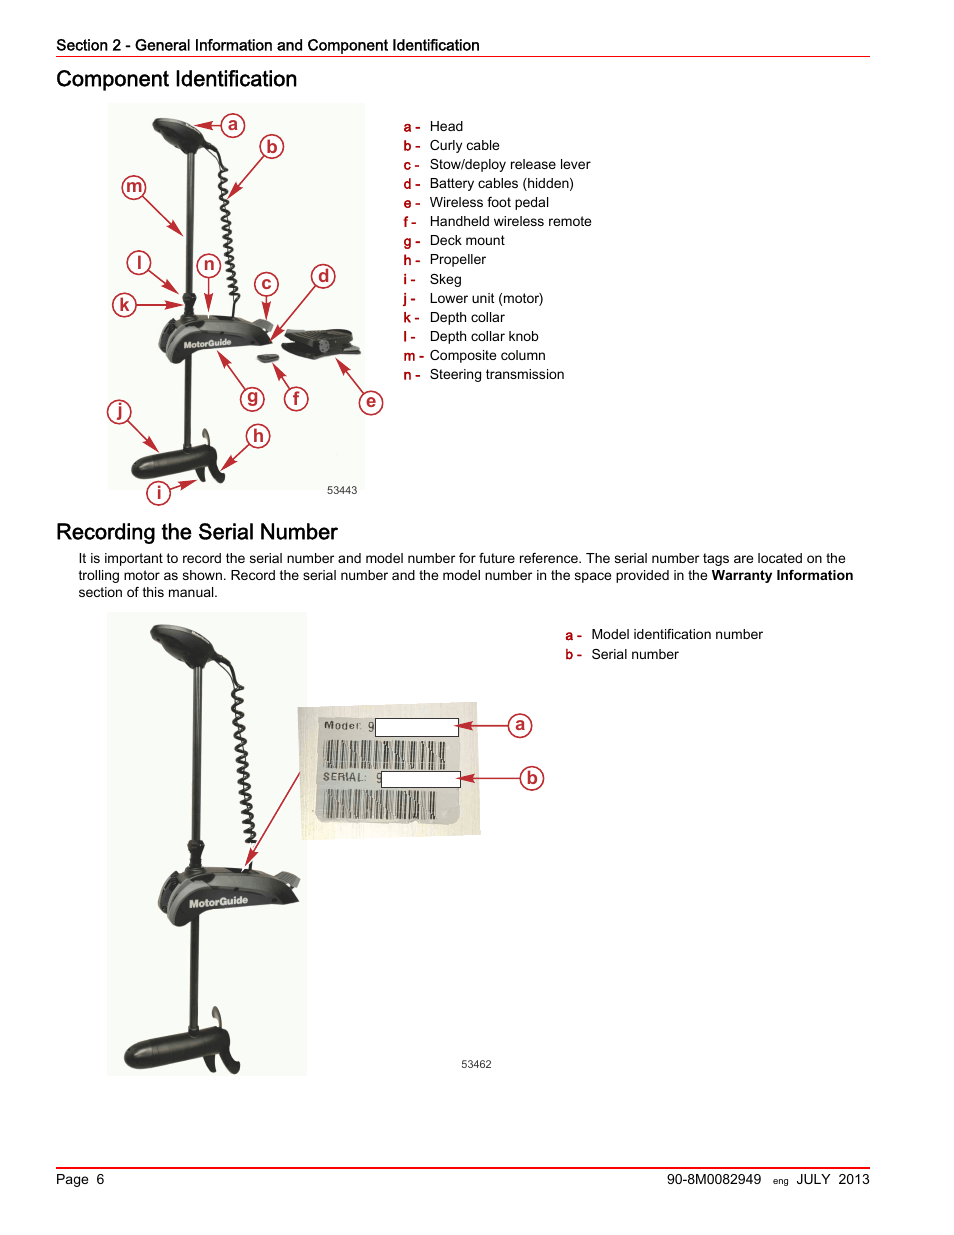 Motorguide Wireless Parts Diagram Data Wiring Diagrams. Trolling Motor Foot  Pedel Wiring Diagram ...